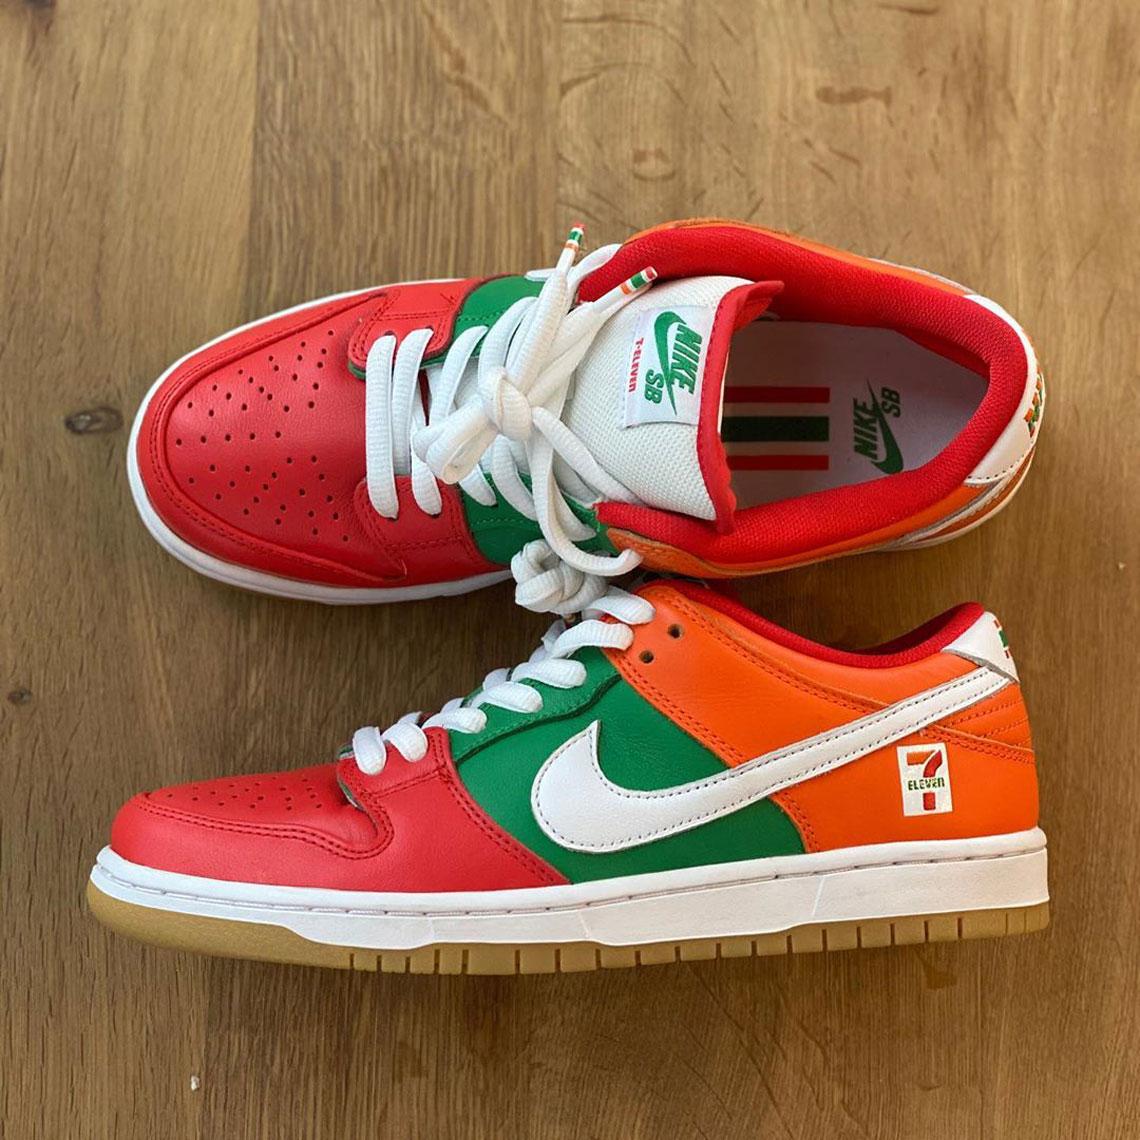 Nike SB Dunk Low 7-Eleven Release Date